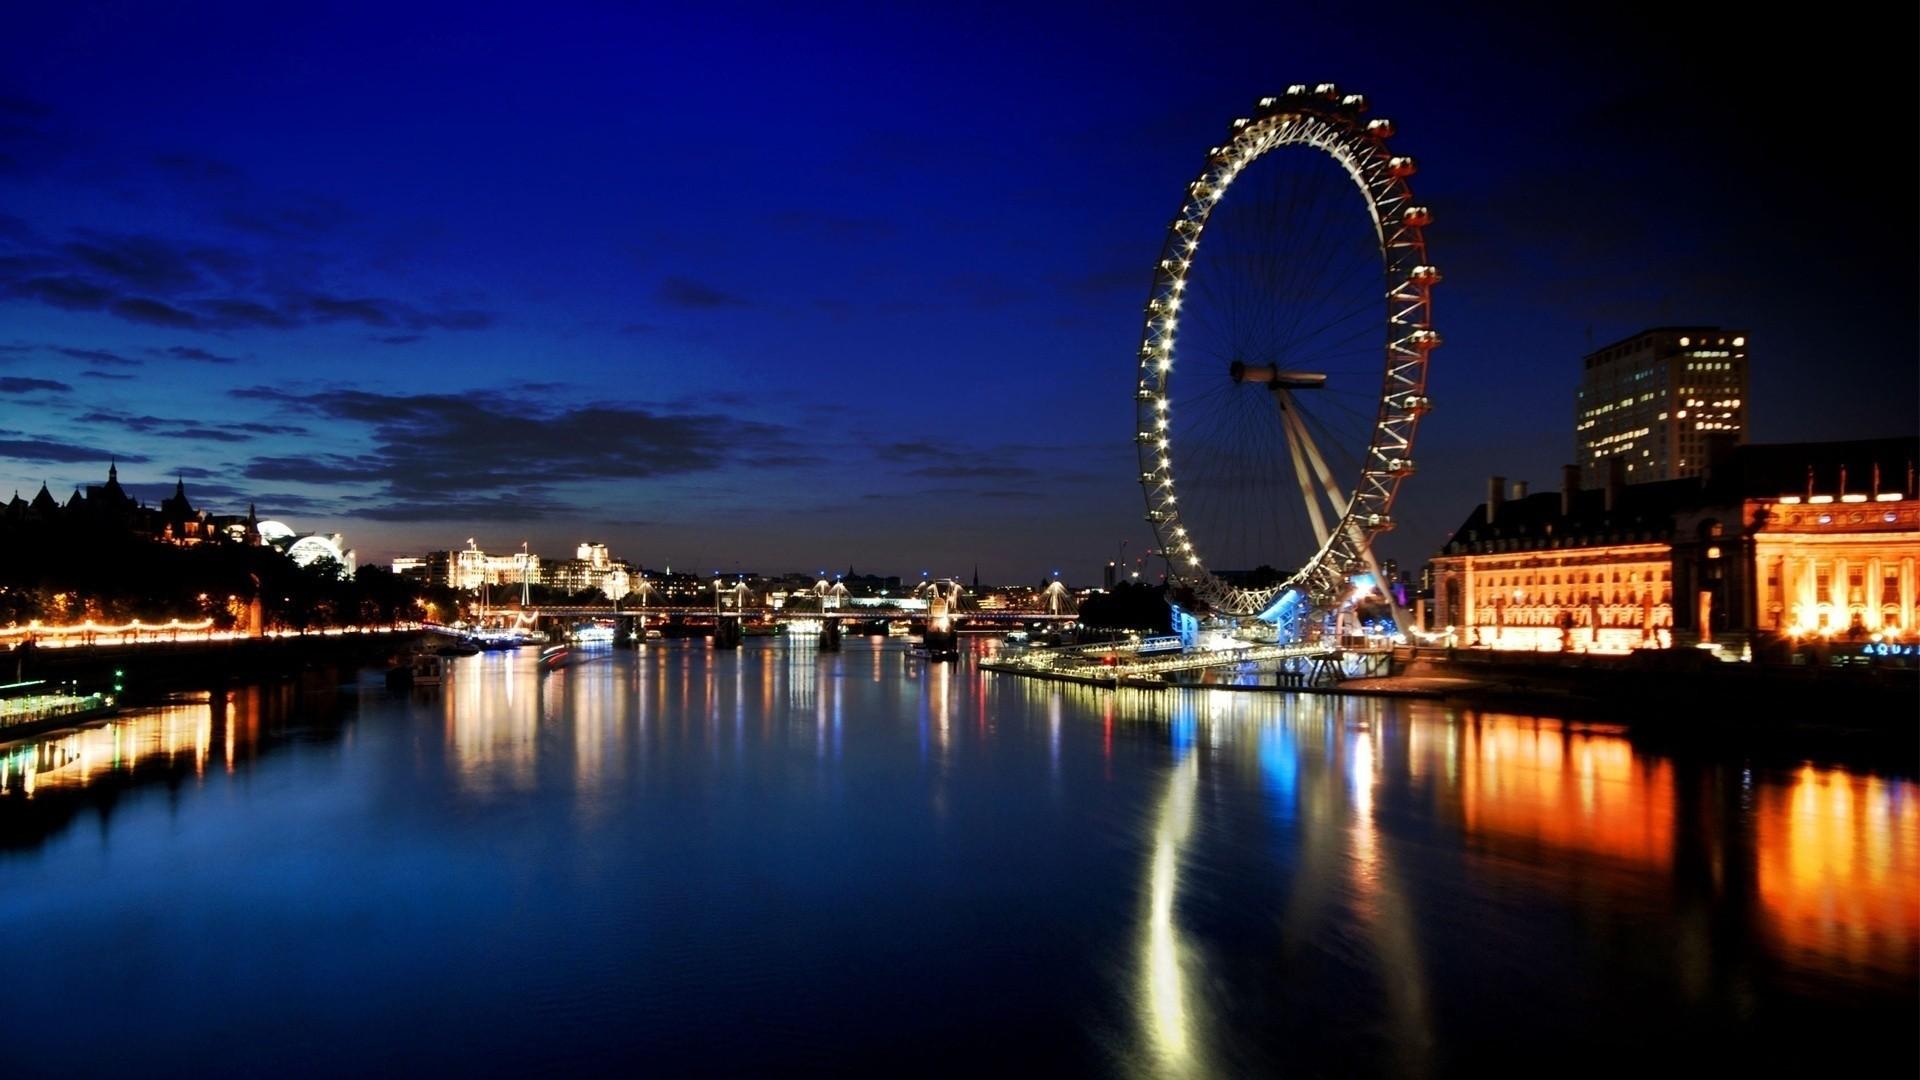 General 1920x1080 cityscape reflection river London Eye River Thames UK London water night lights